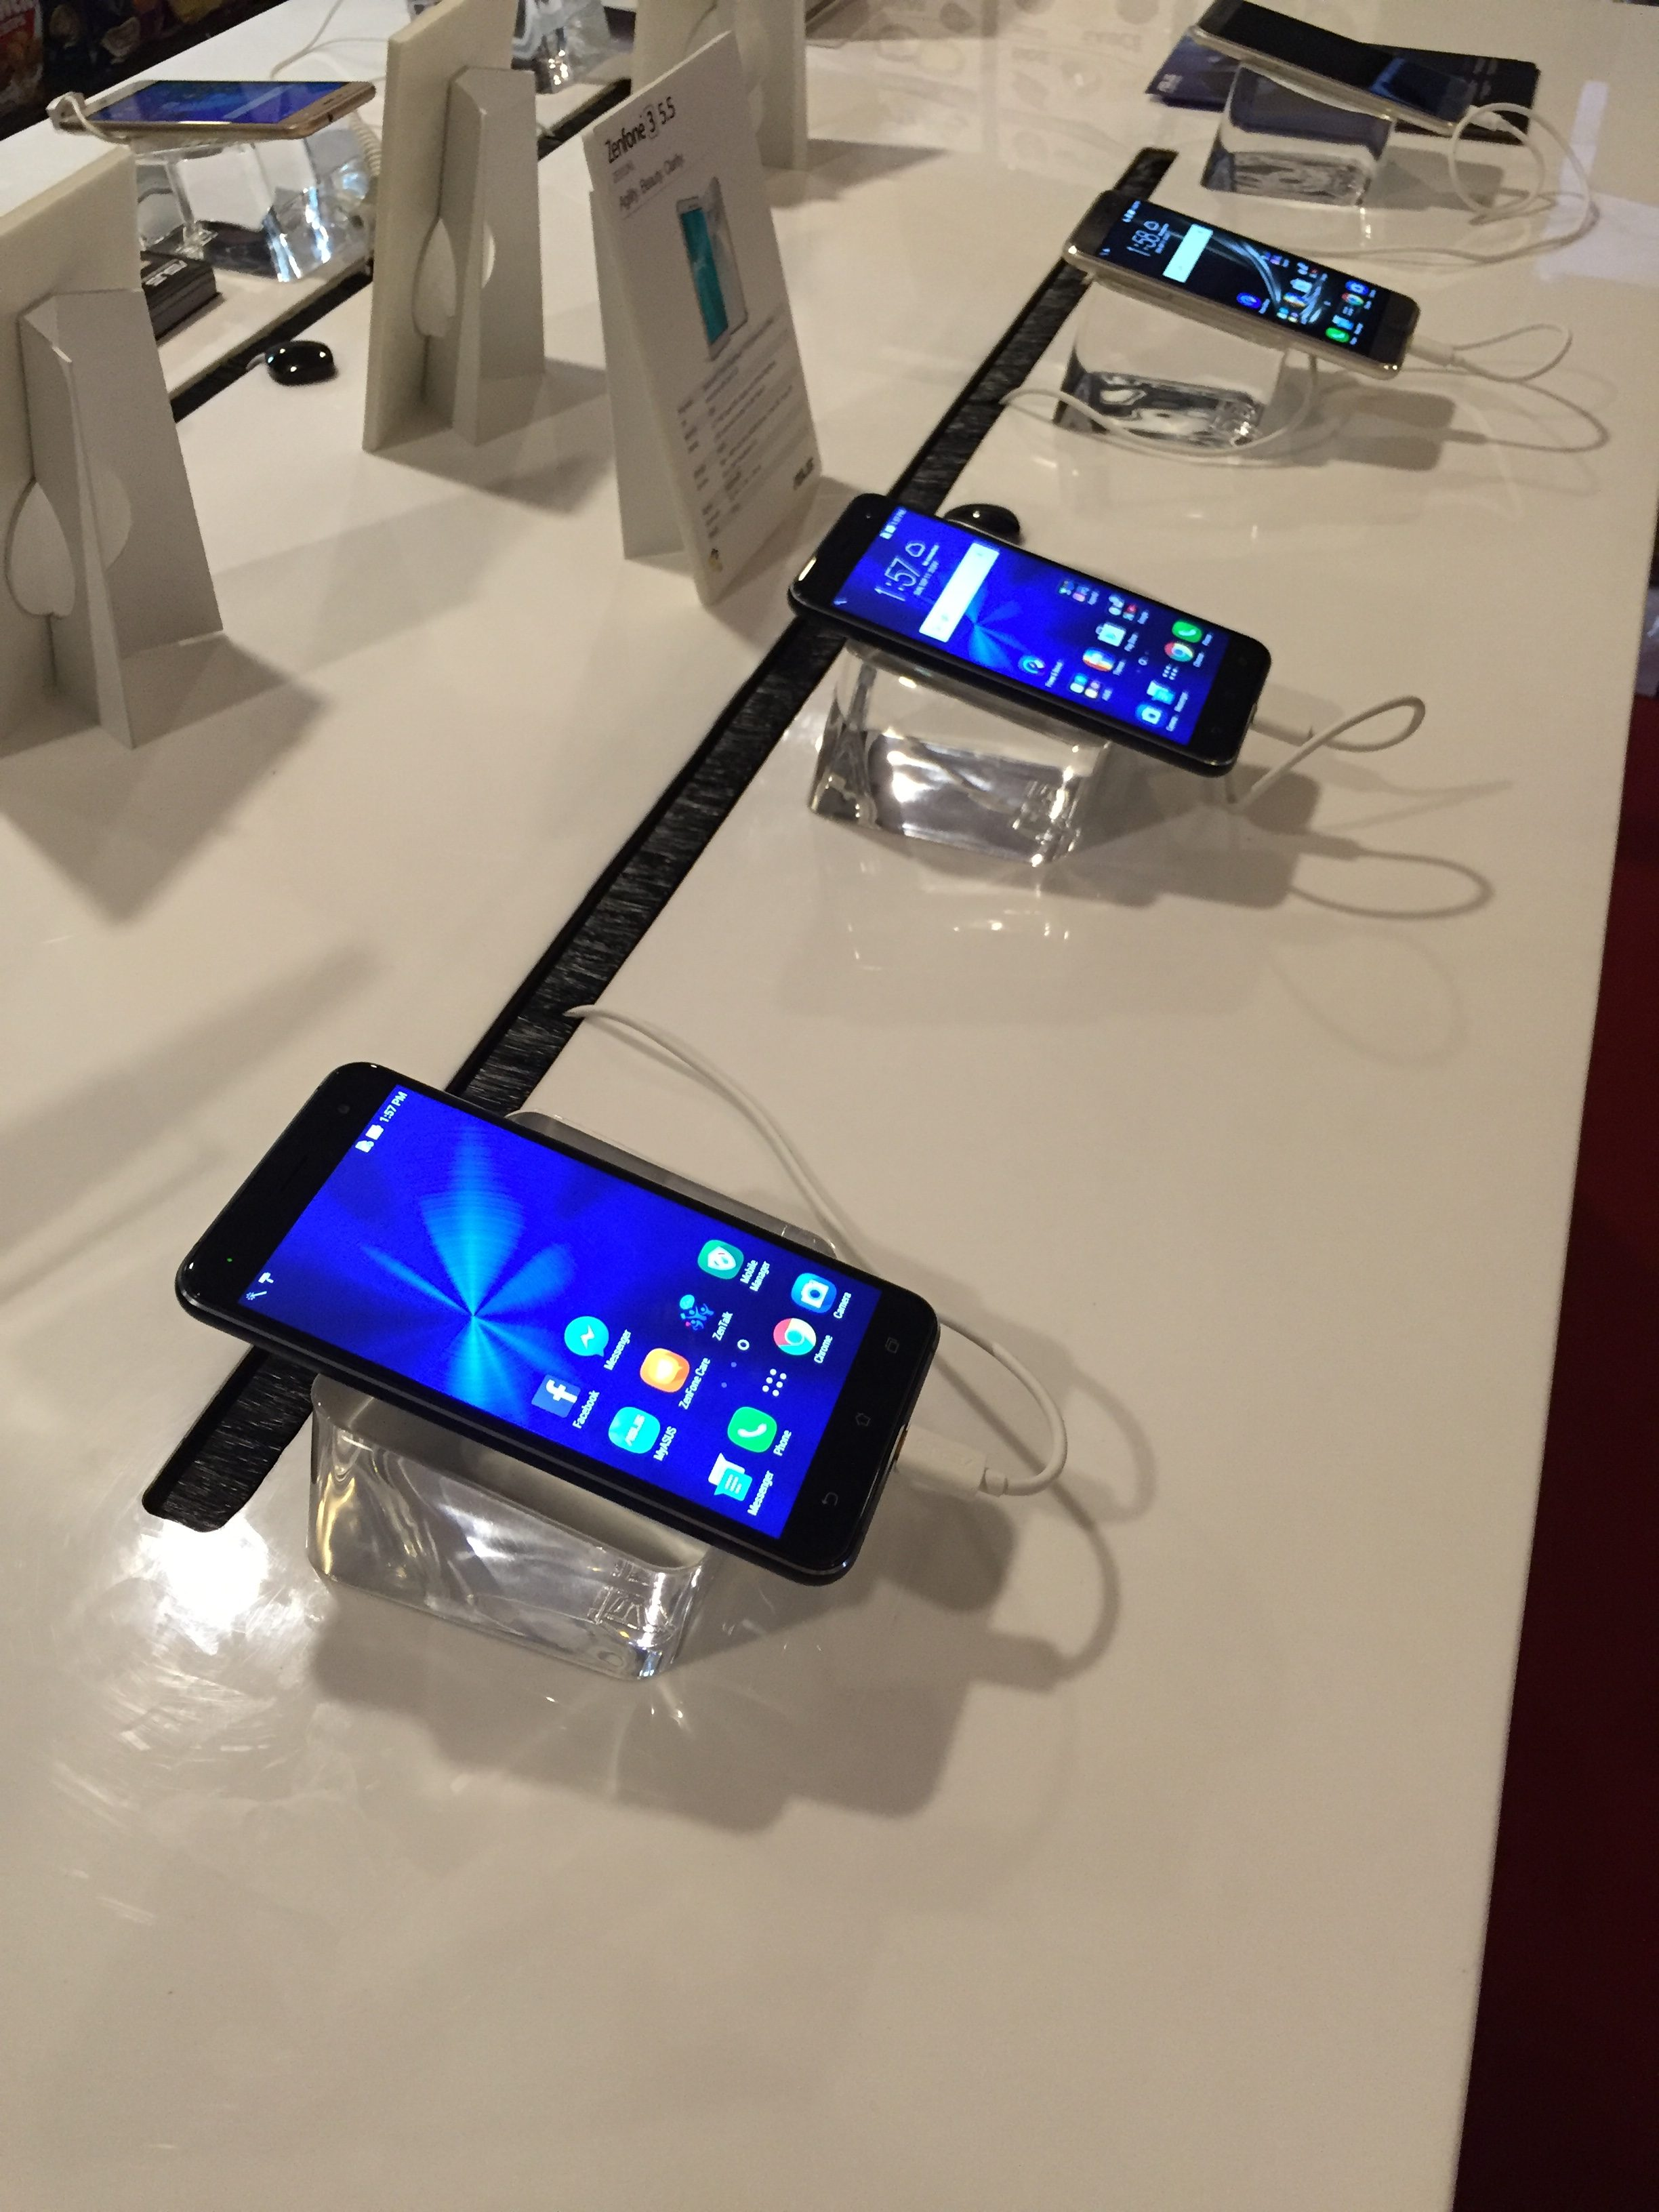 Asus mobile phones on full display!